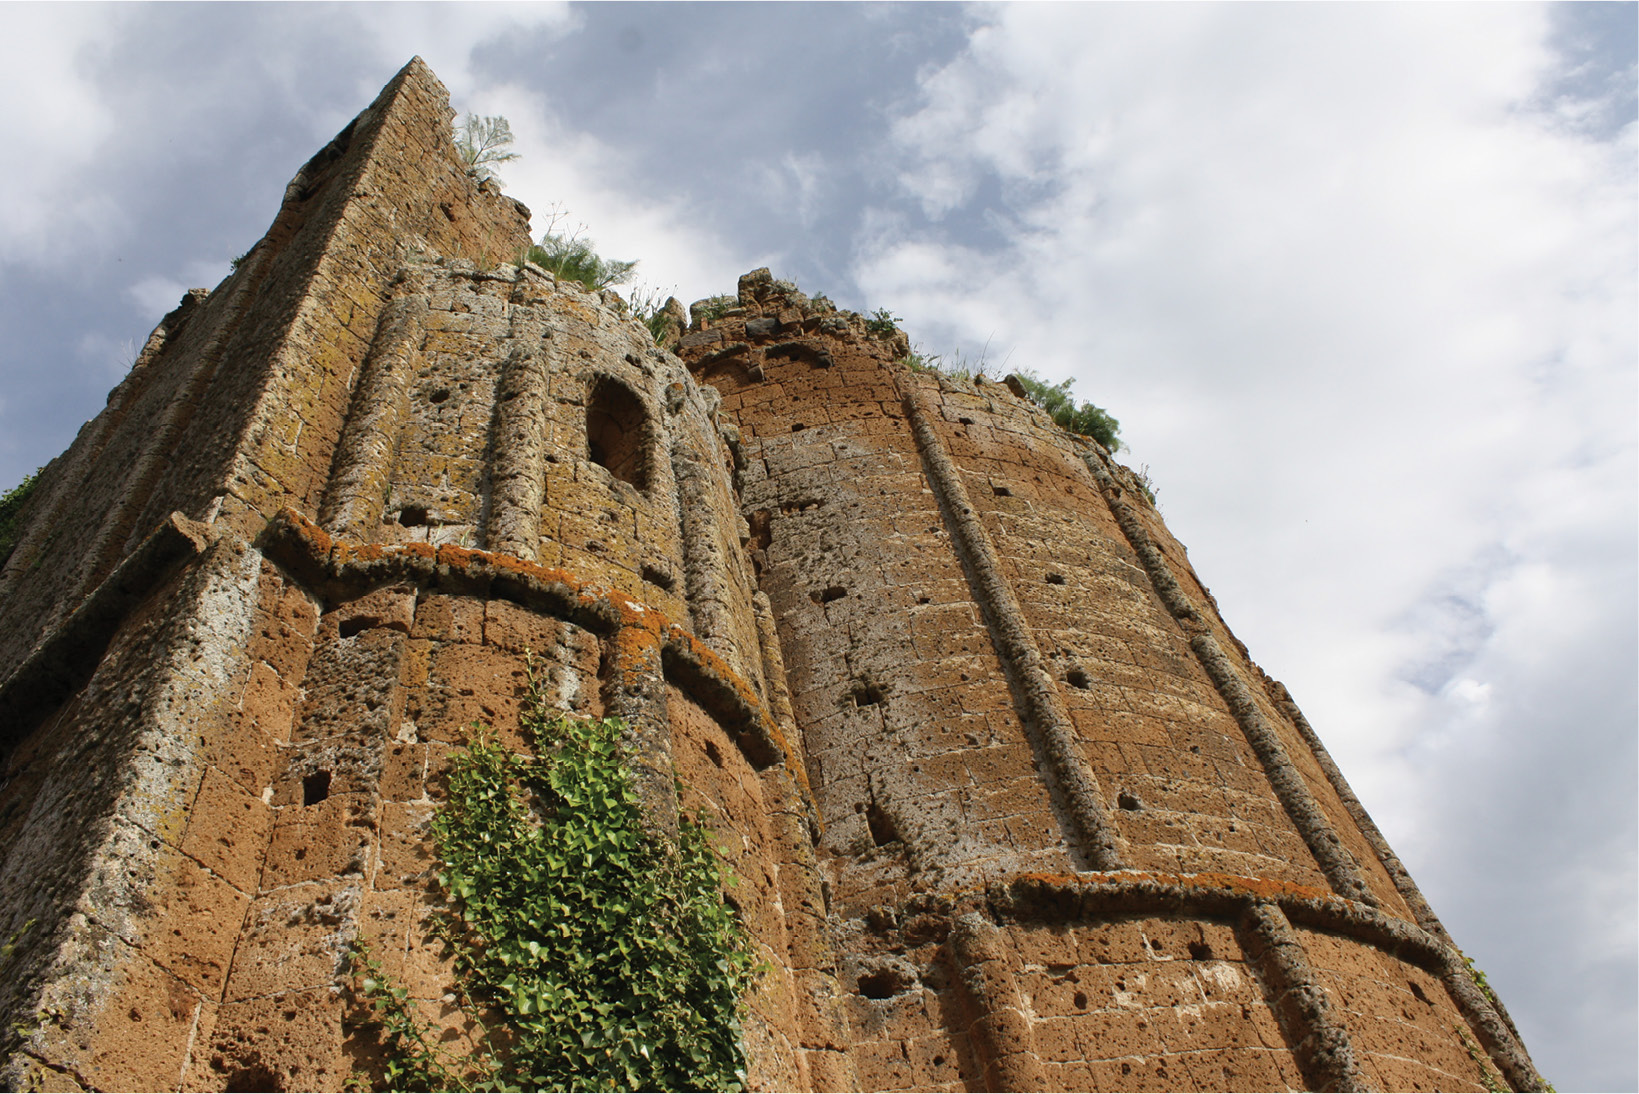 The Lost City of Norchia